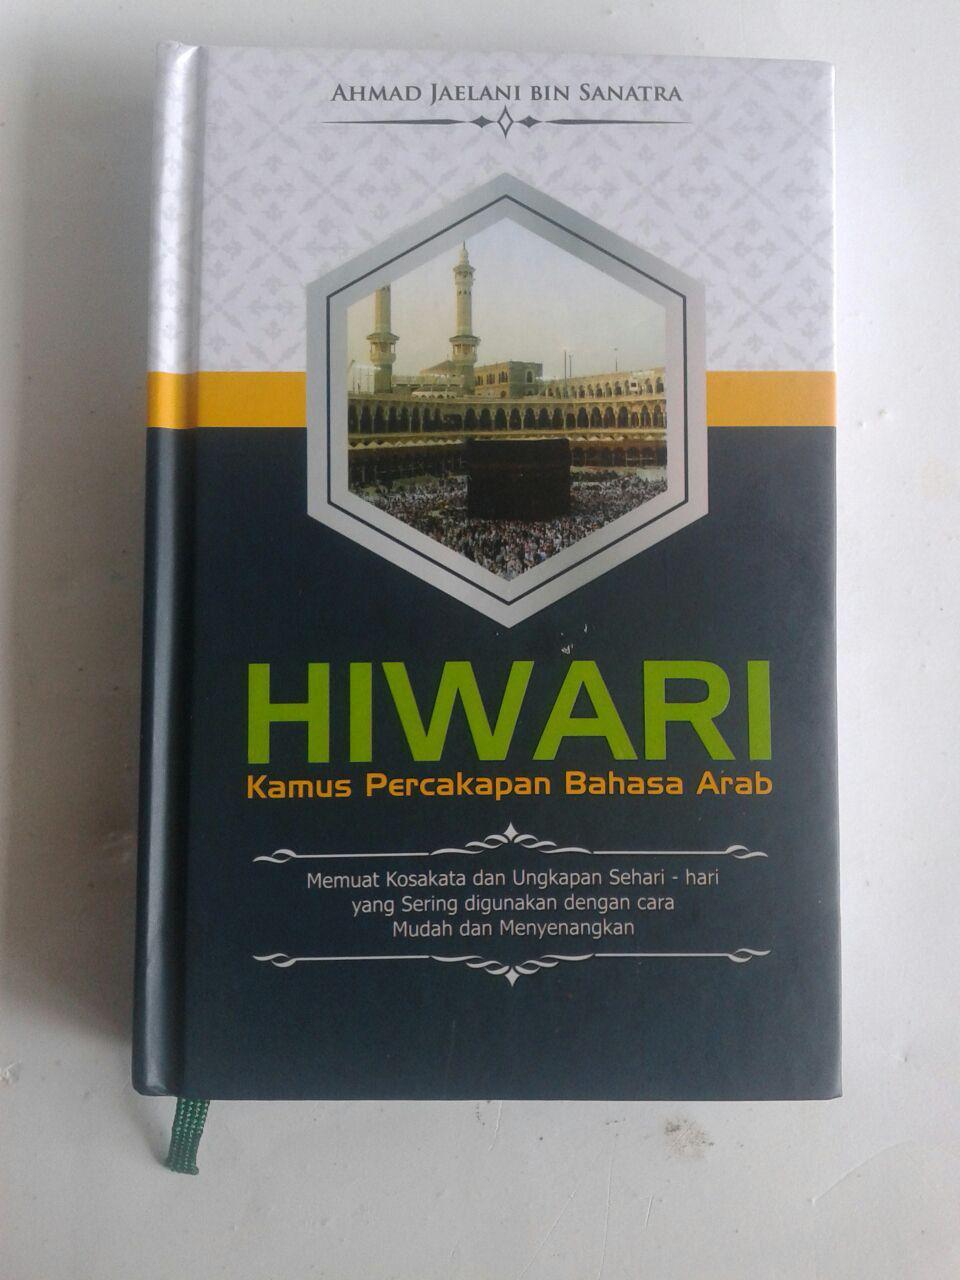 Buku Hiwari Kamus Percakapan Bahasa Arab cover 2